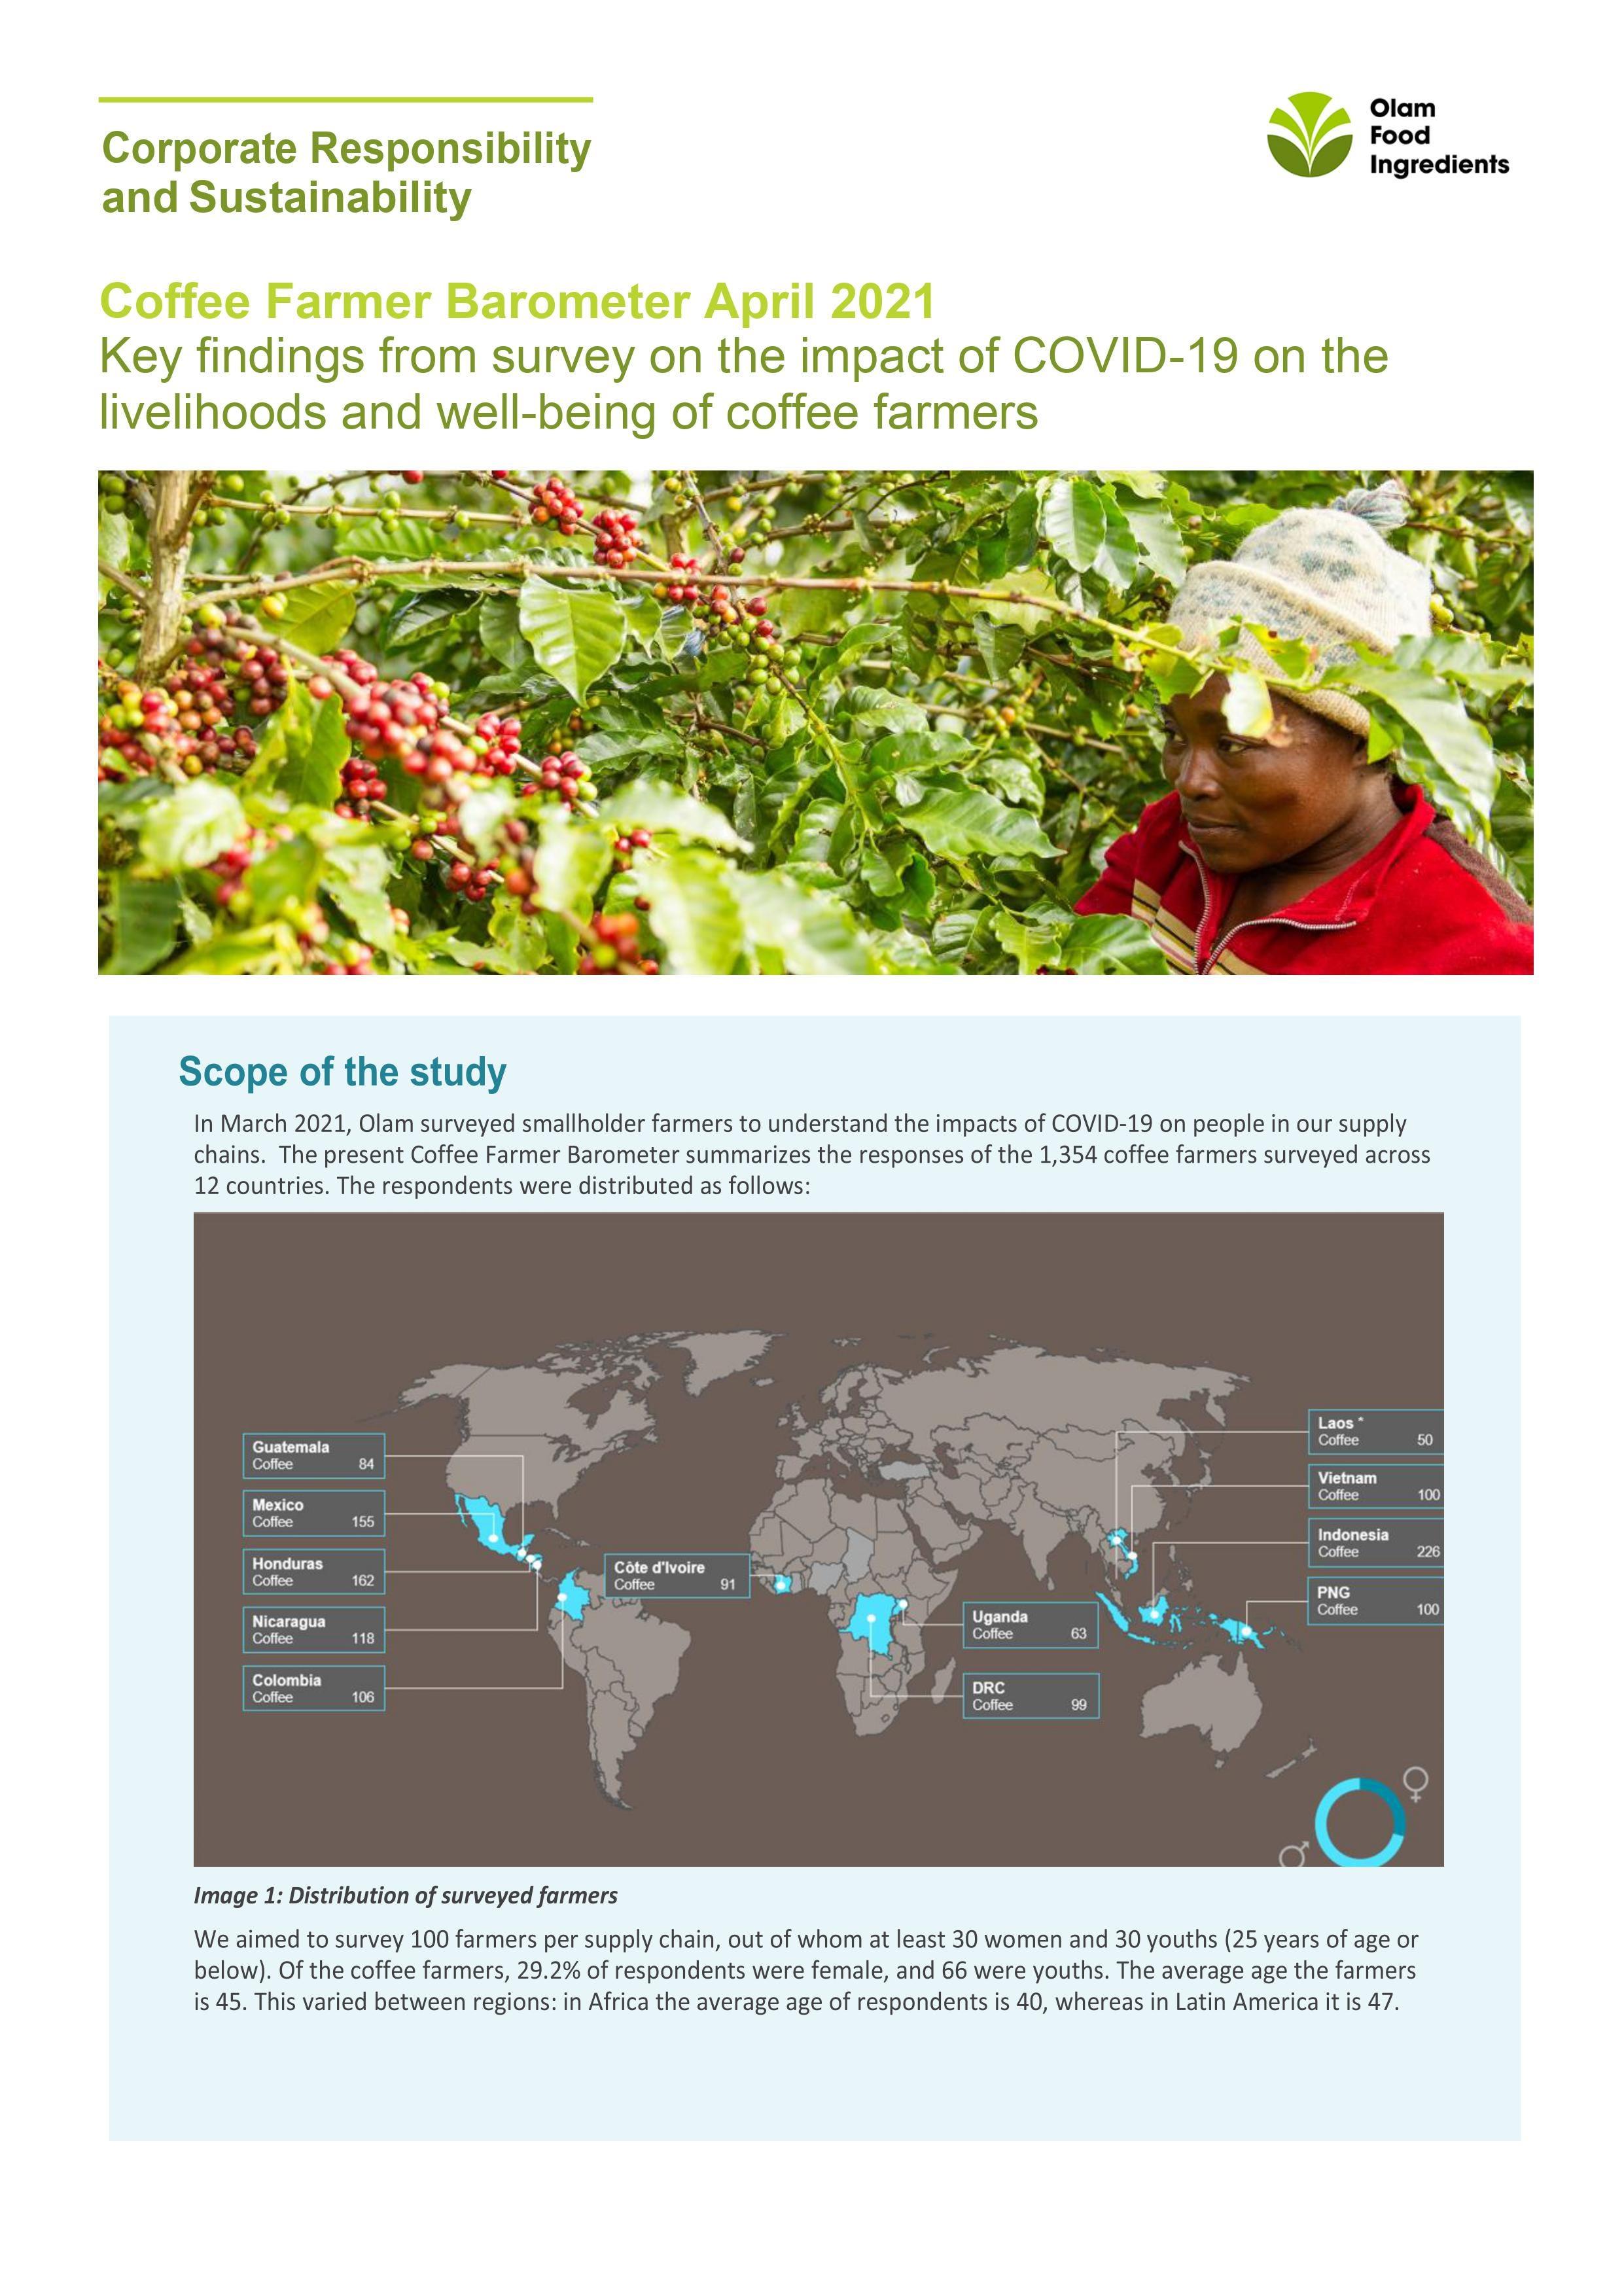 Coffee Farmers and COVID